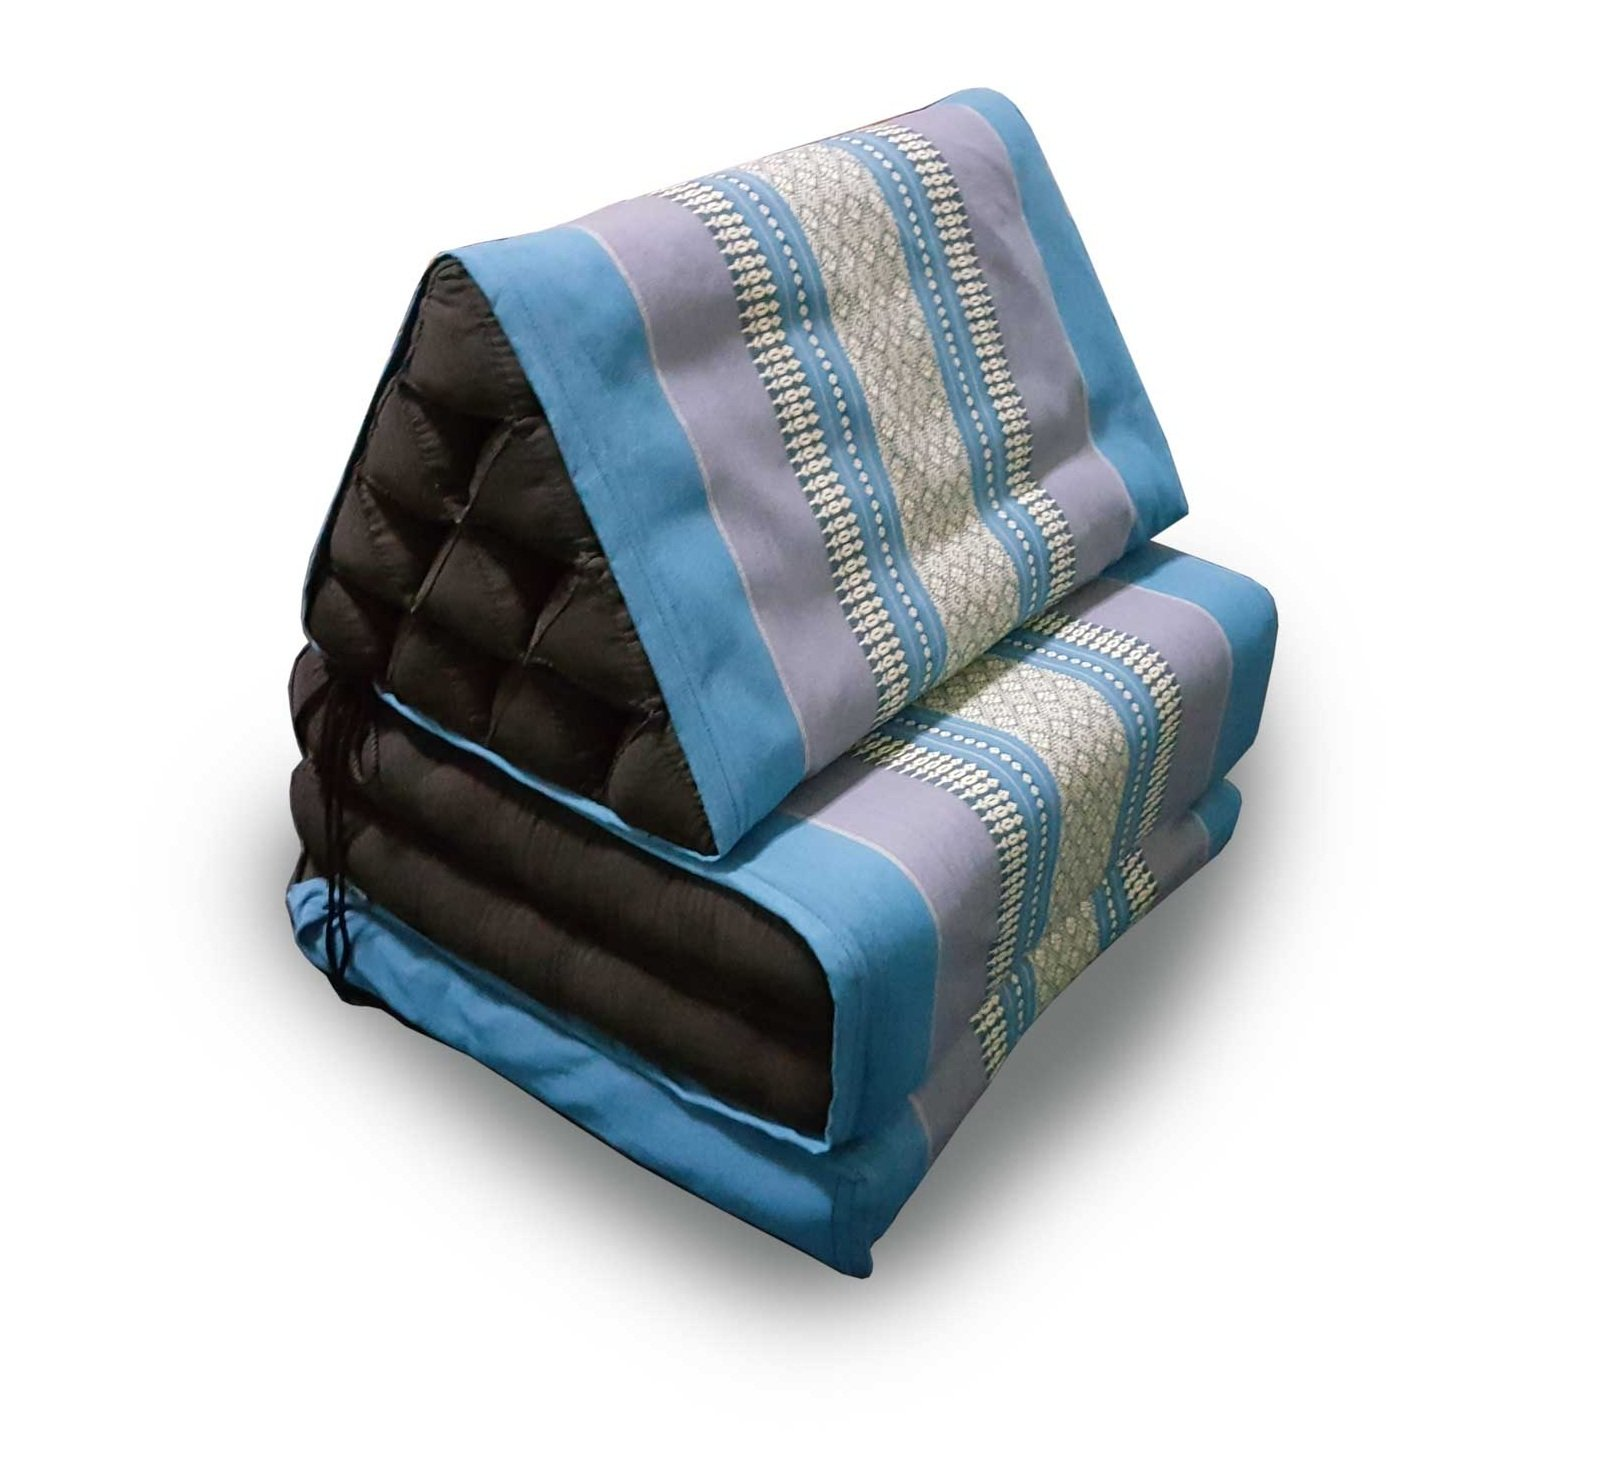 KAIKENG Foldout Triangle Thai Cushion, 67x20x3 inches, Kapok Fabric, Premium Double Stitched, Cover Blue/Cushion Black